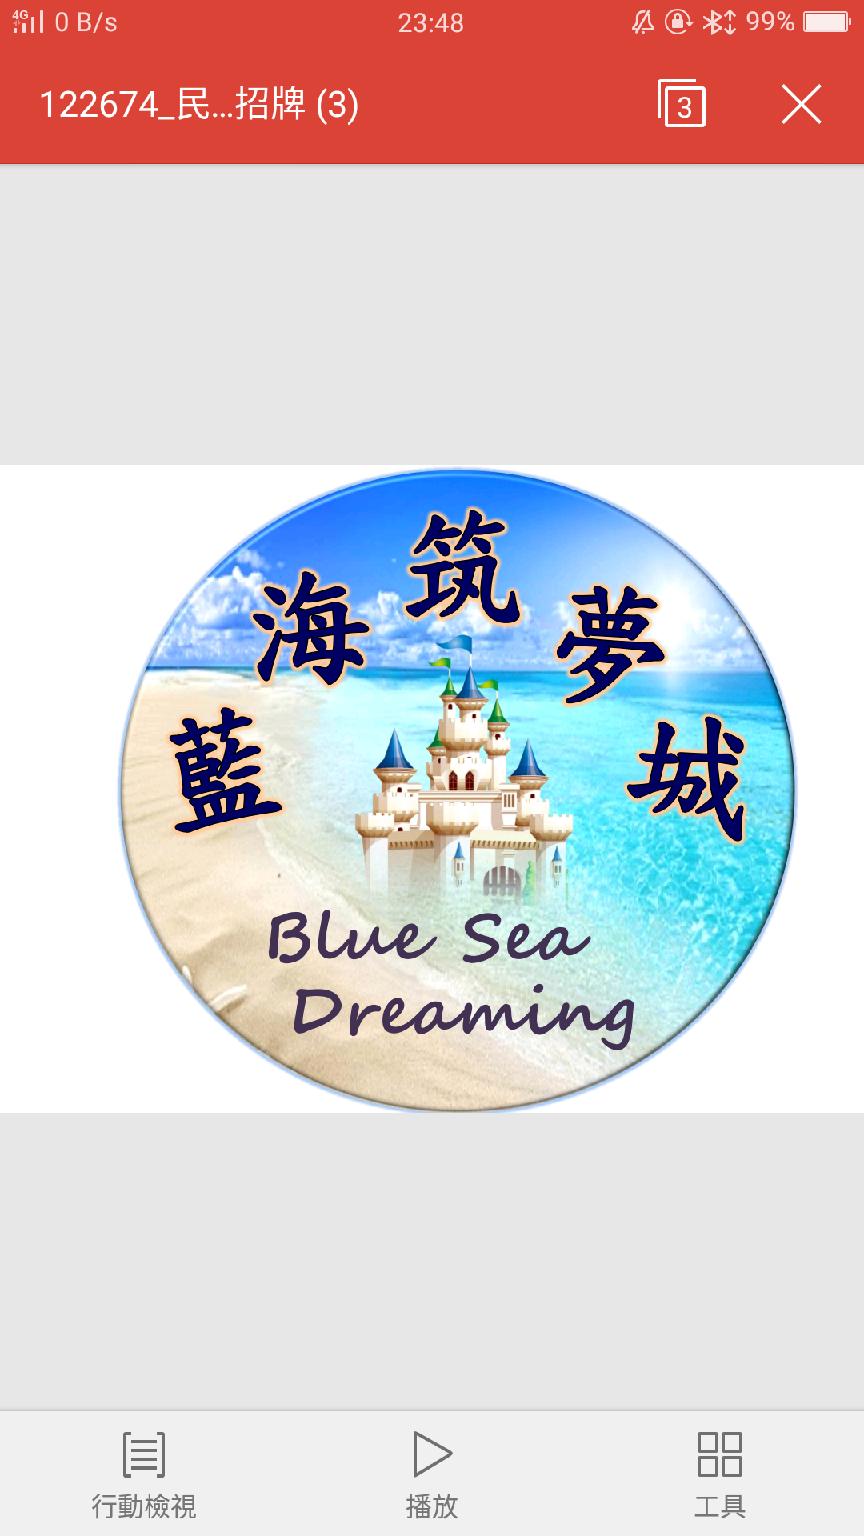 Blue Sea Dreaming